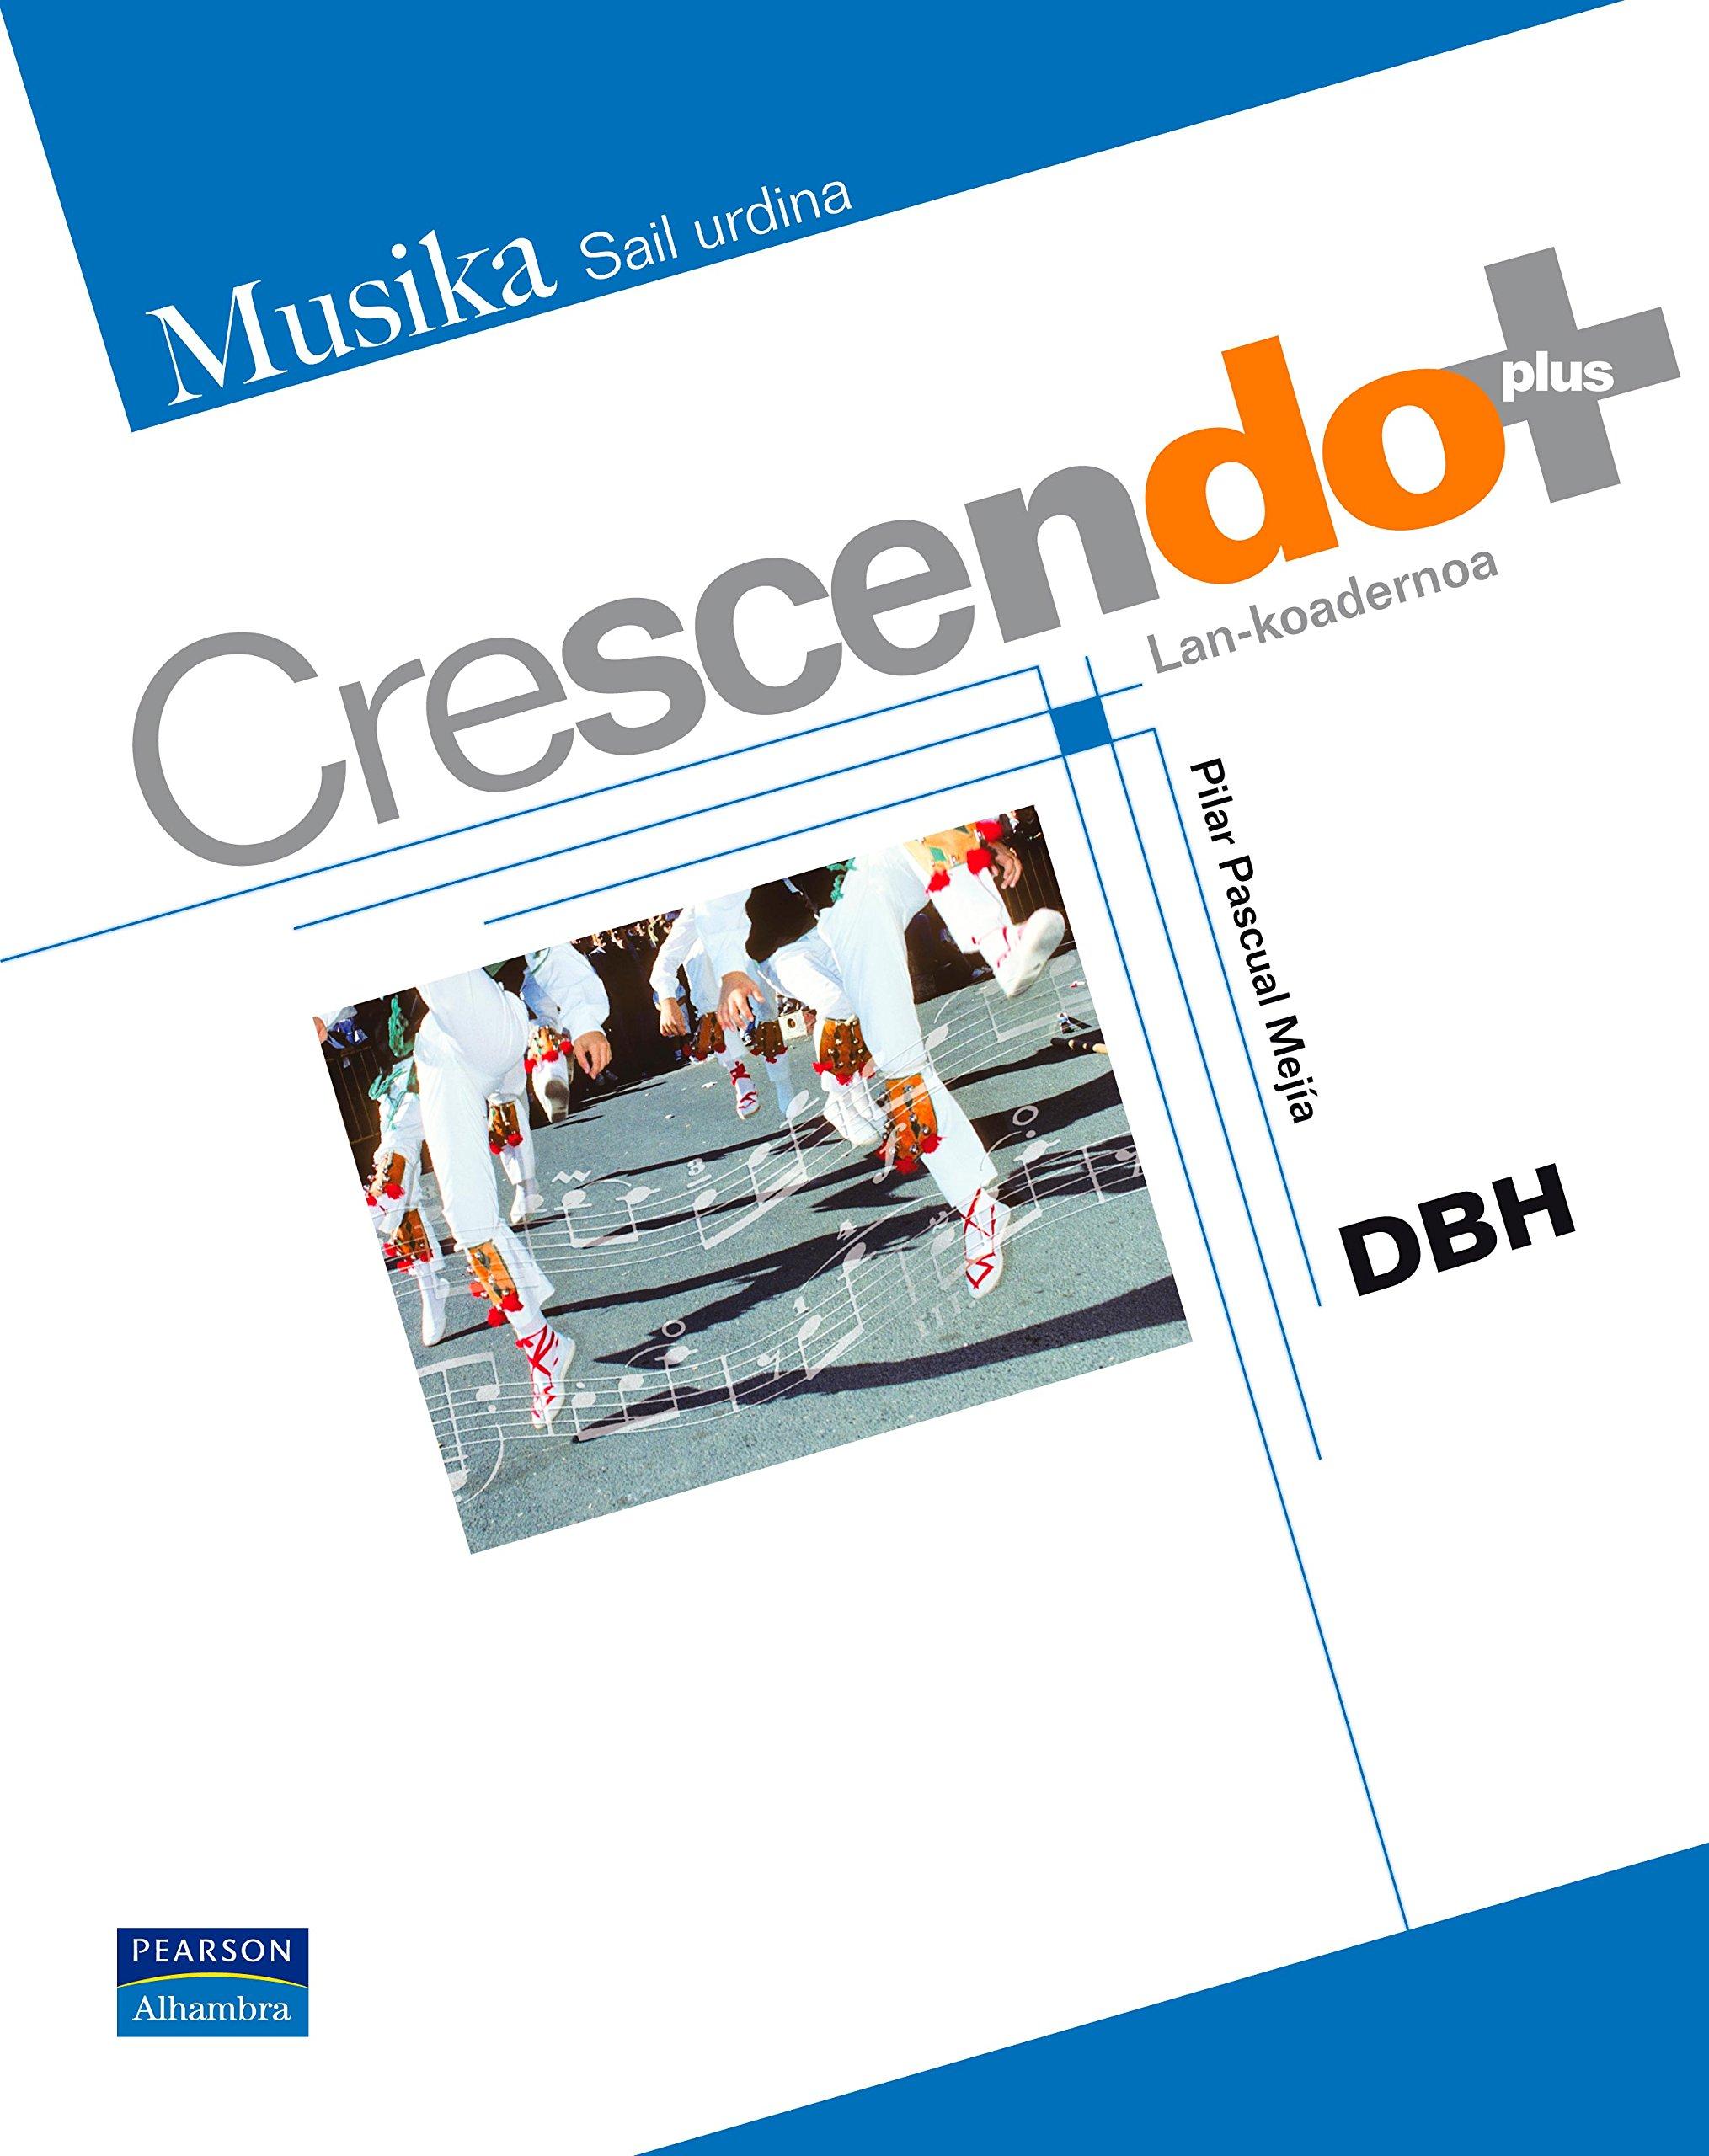 Crescendo plus lankoadernoa - 9788420554181: Amazon.es ...